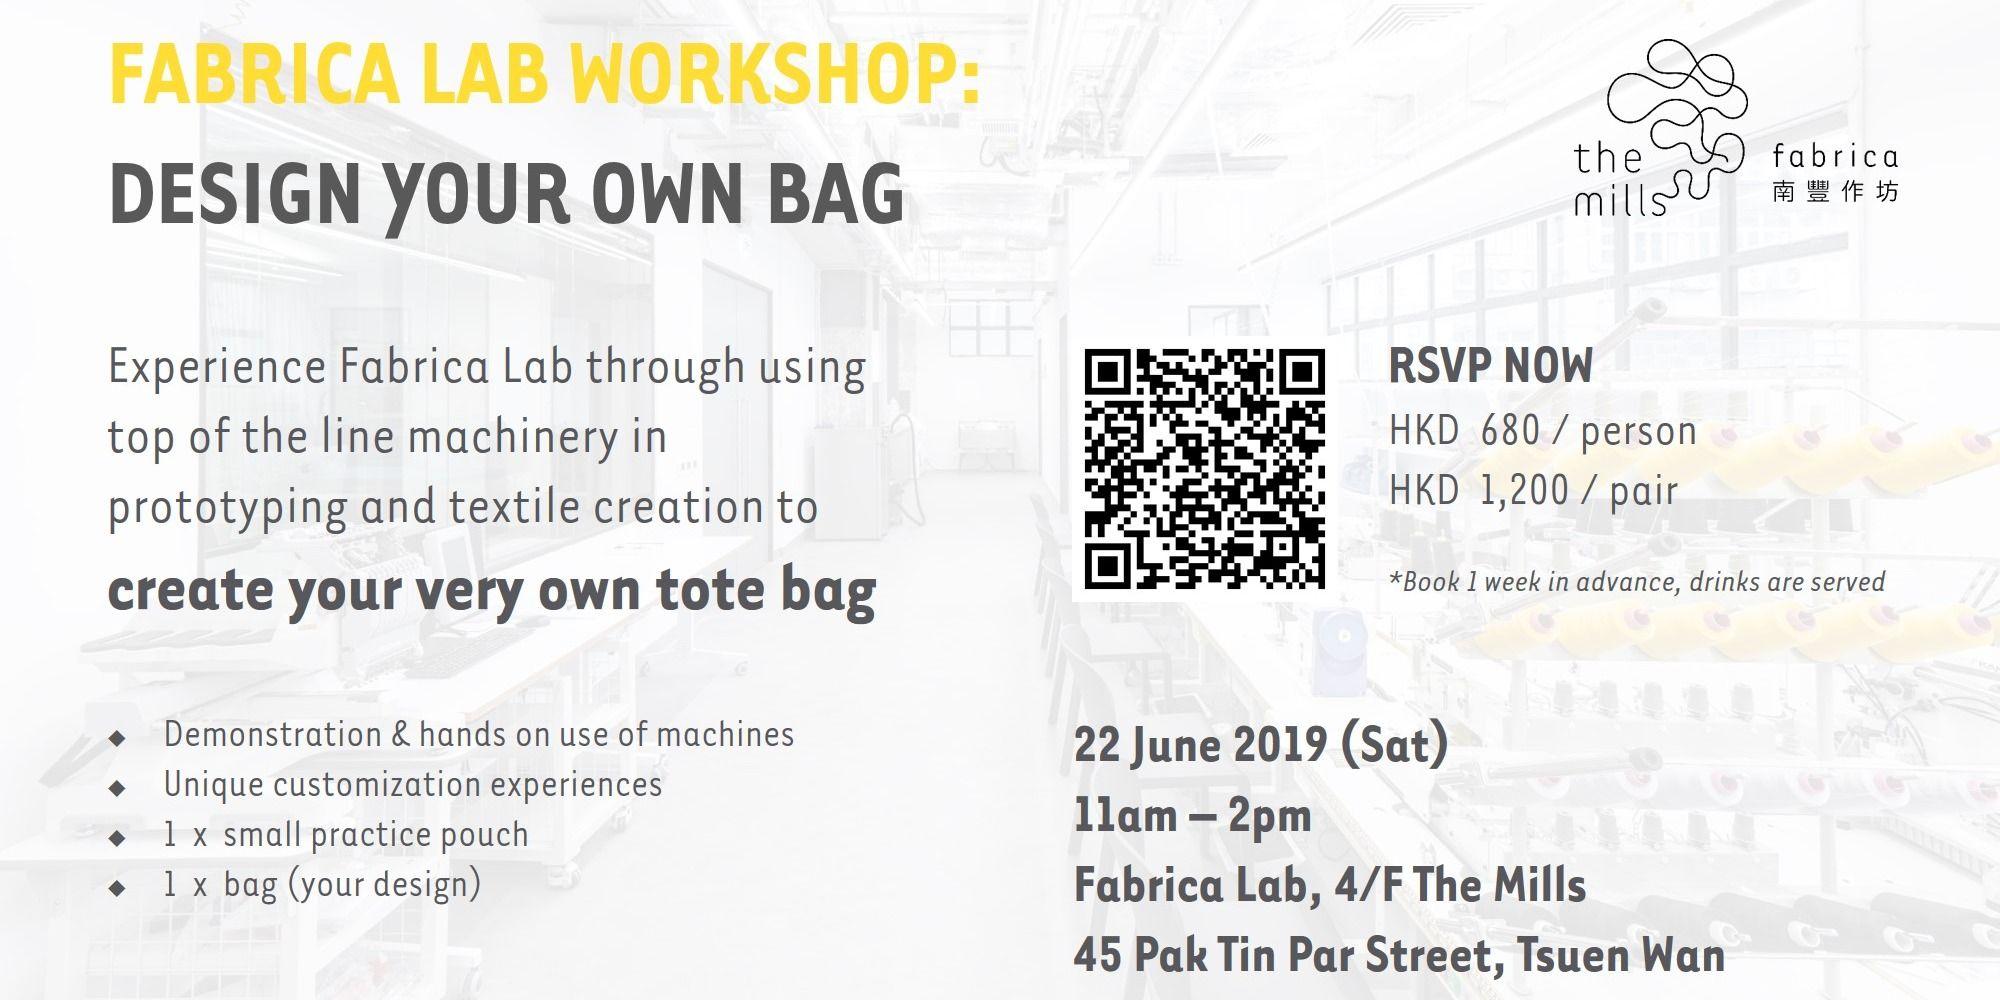 Fabrica Lab Workshop: Design Your Own Bag